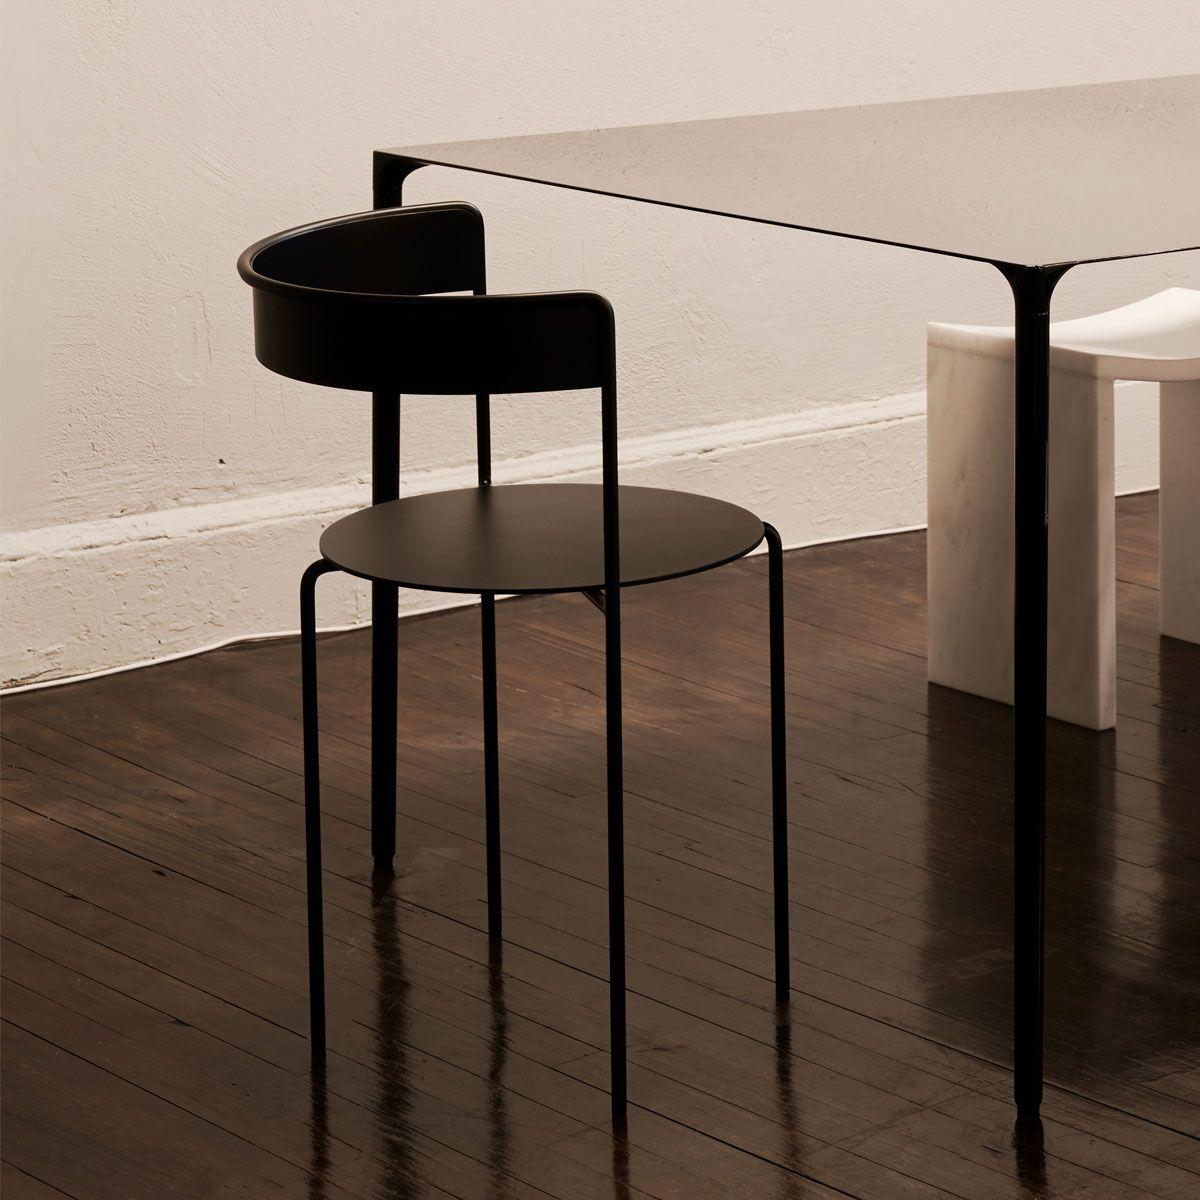 Matter Made | Avoa #design #chair #furniture #chaise #interiordesign ...